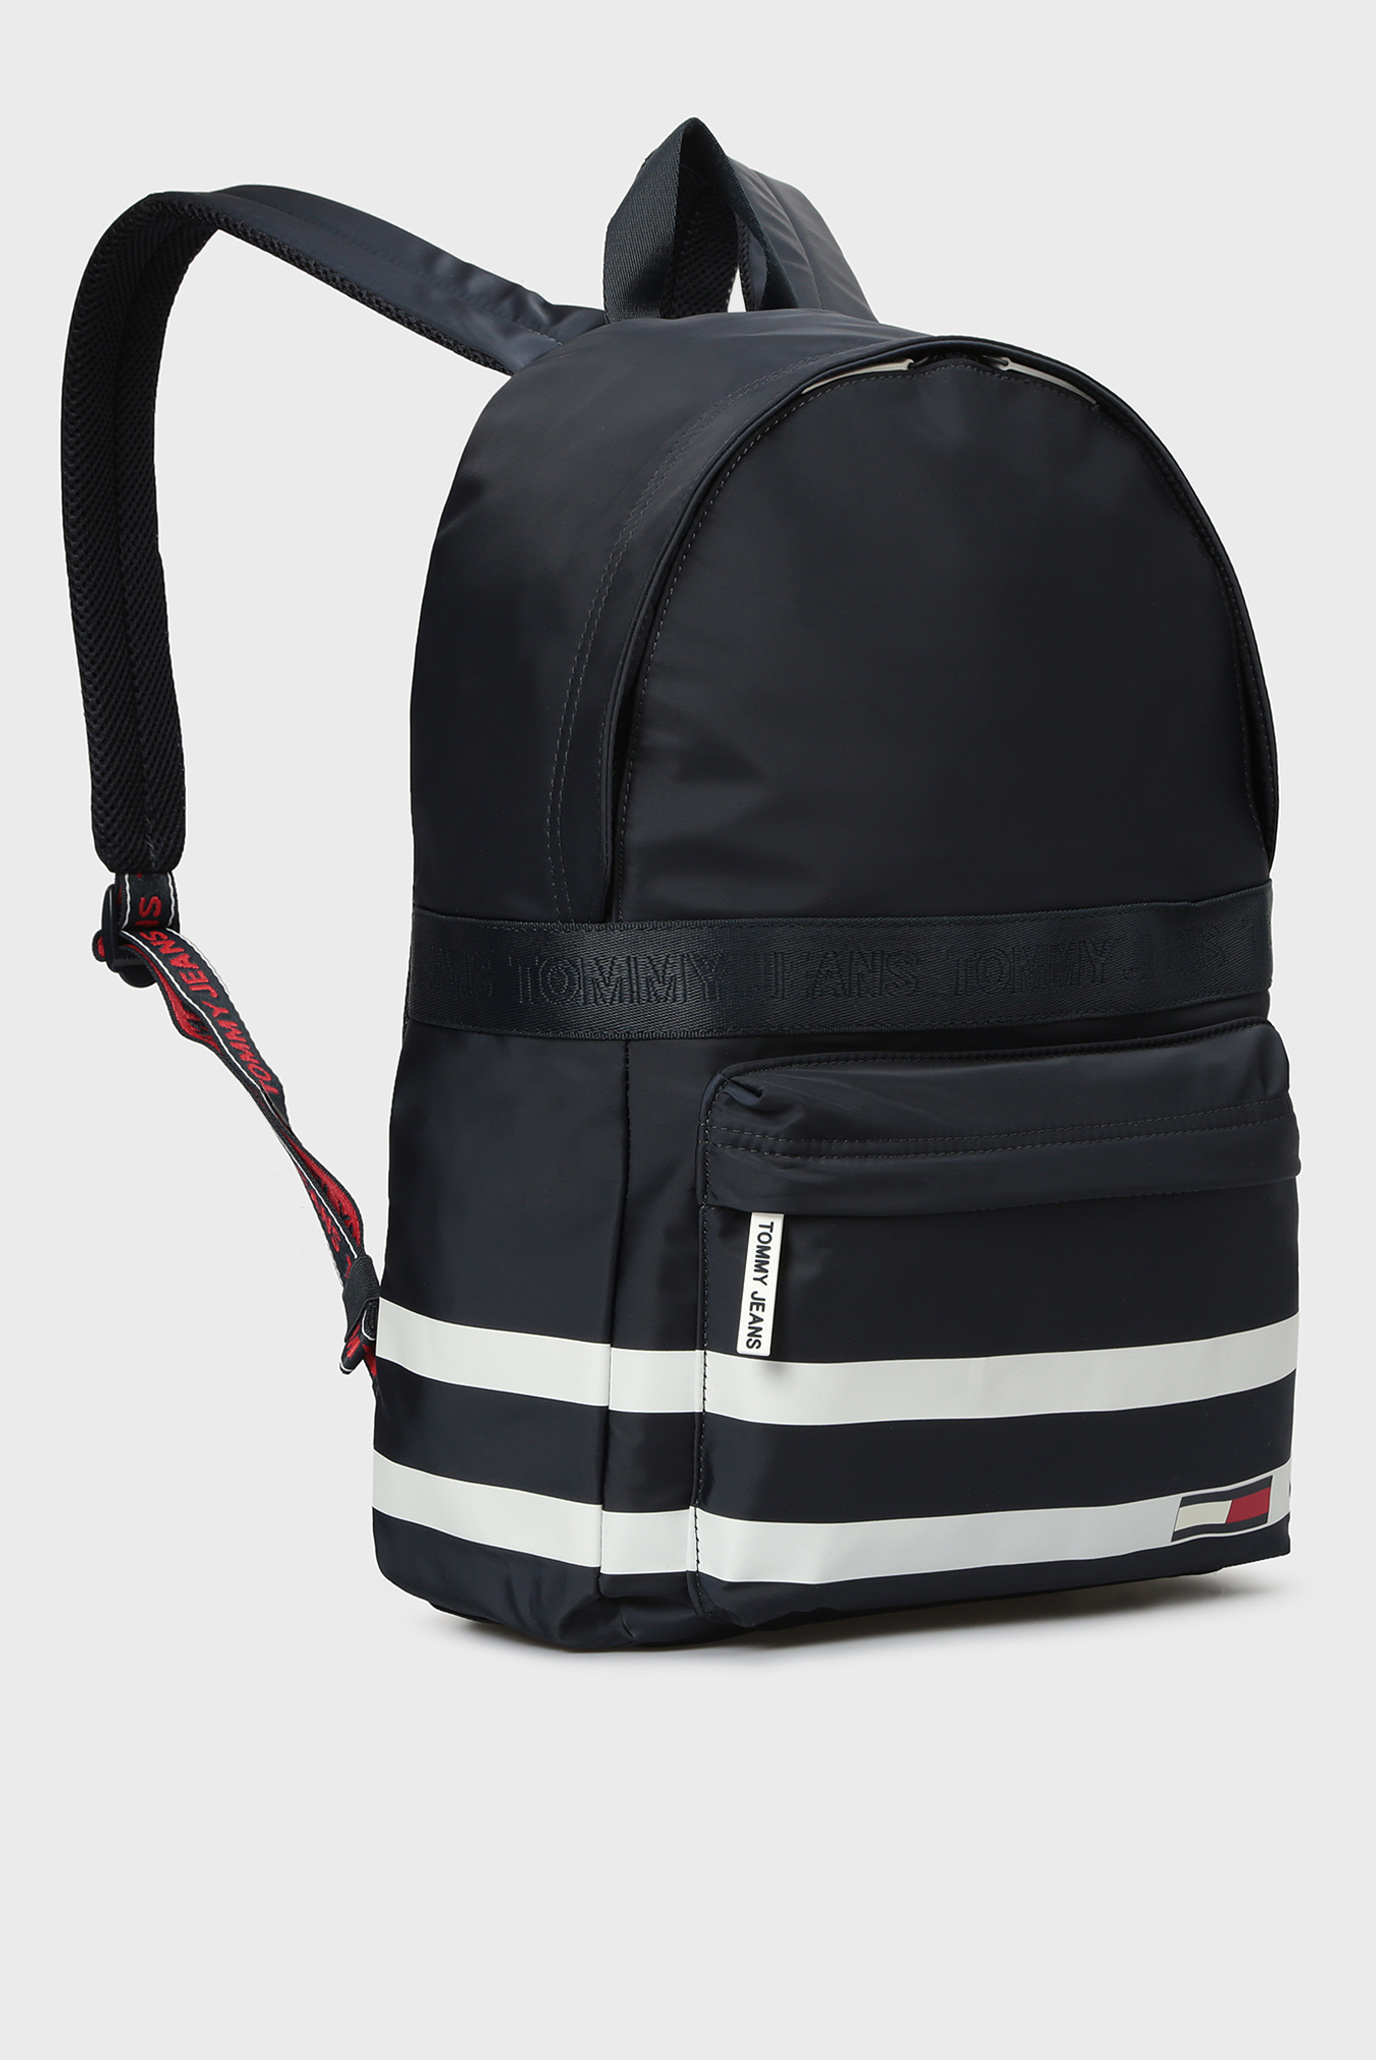 Купить Темно-синий рюкзак TJ VARSITY CLASSIC Tommy Hilfiger Tommy Hilfiger AU0AU00253 – Киев, Украина. Цены в интернет магазине MD Fashion